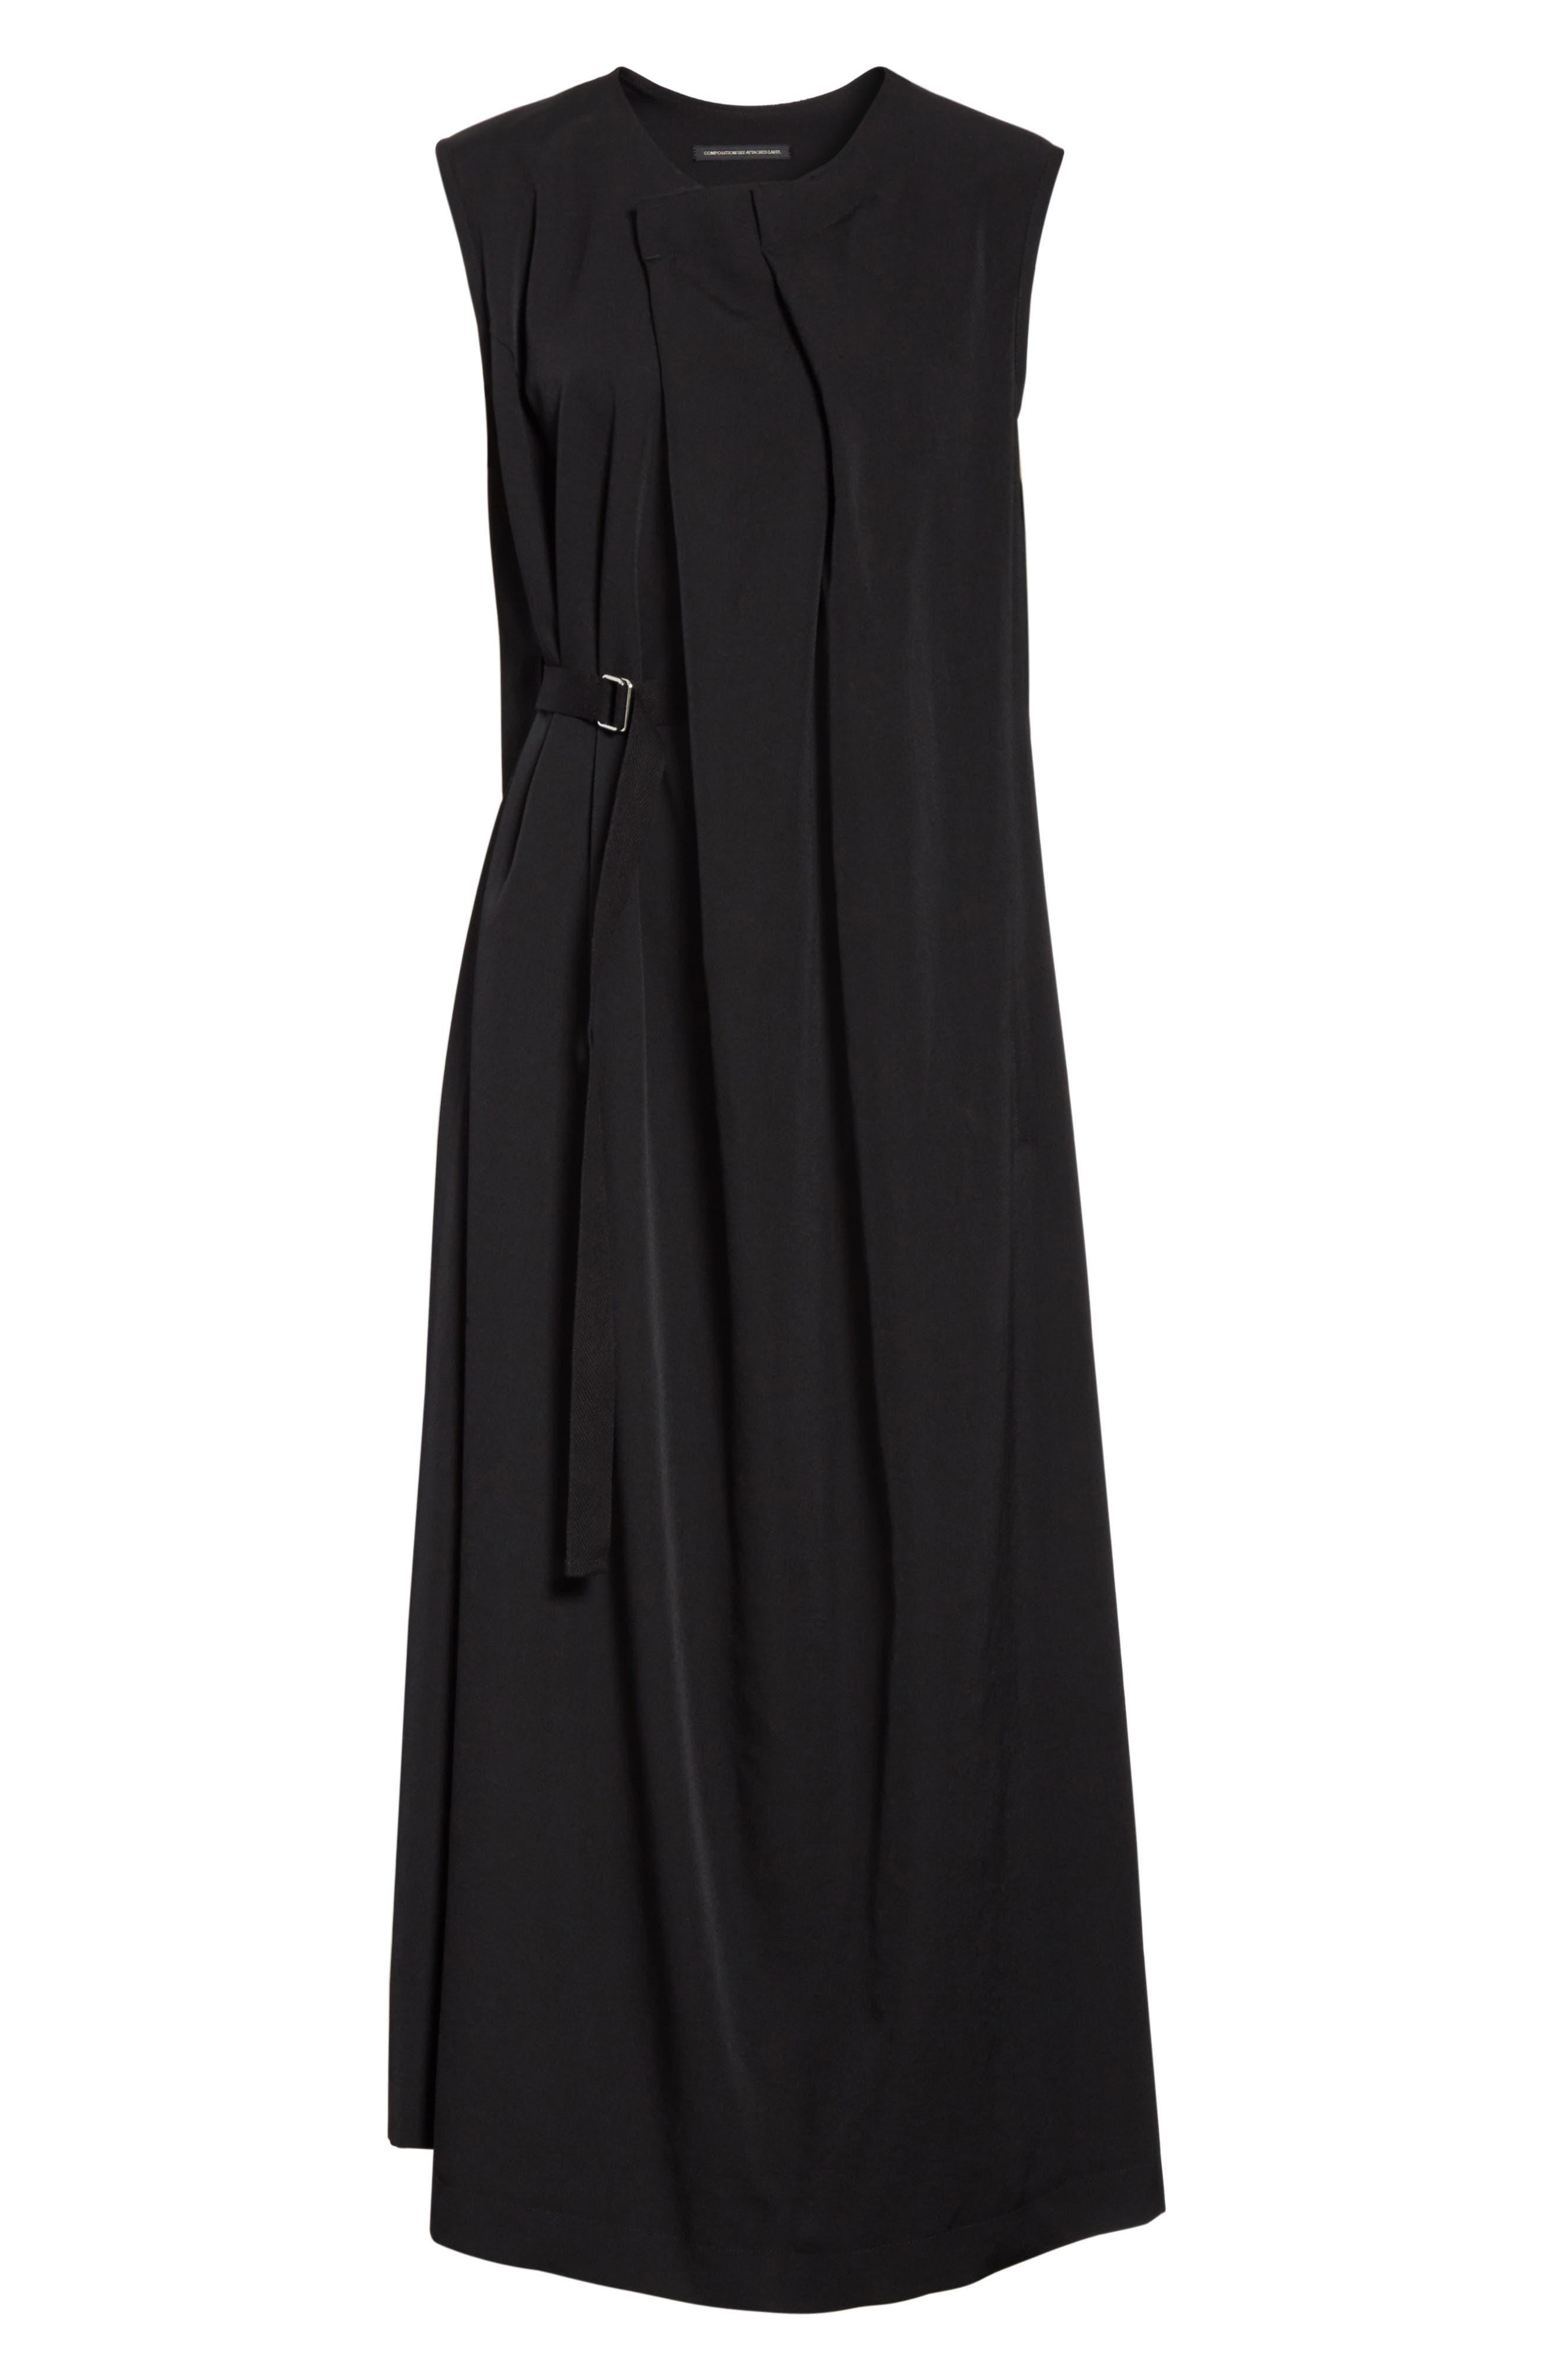 N-F Pleats Dress,                             Alternate thumbnail 6, color,                             001